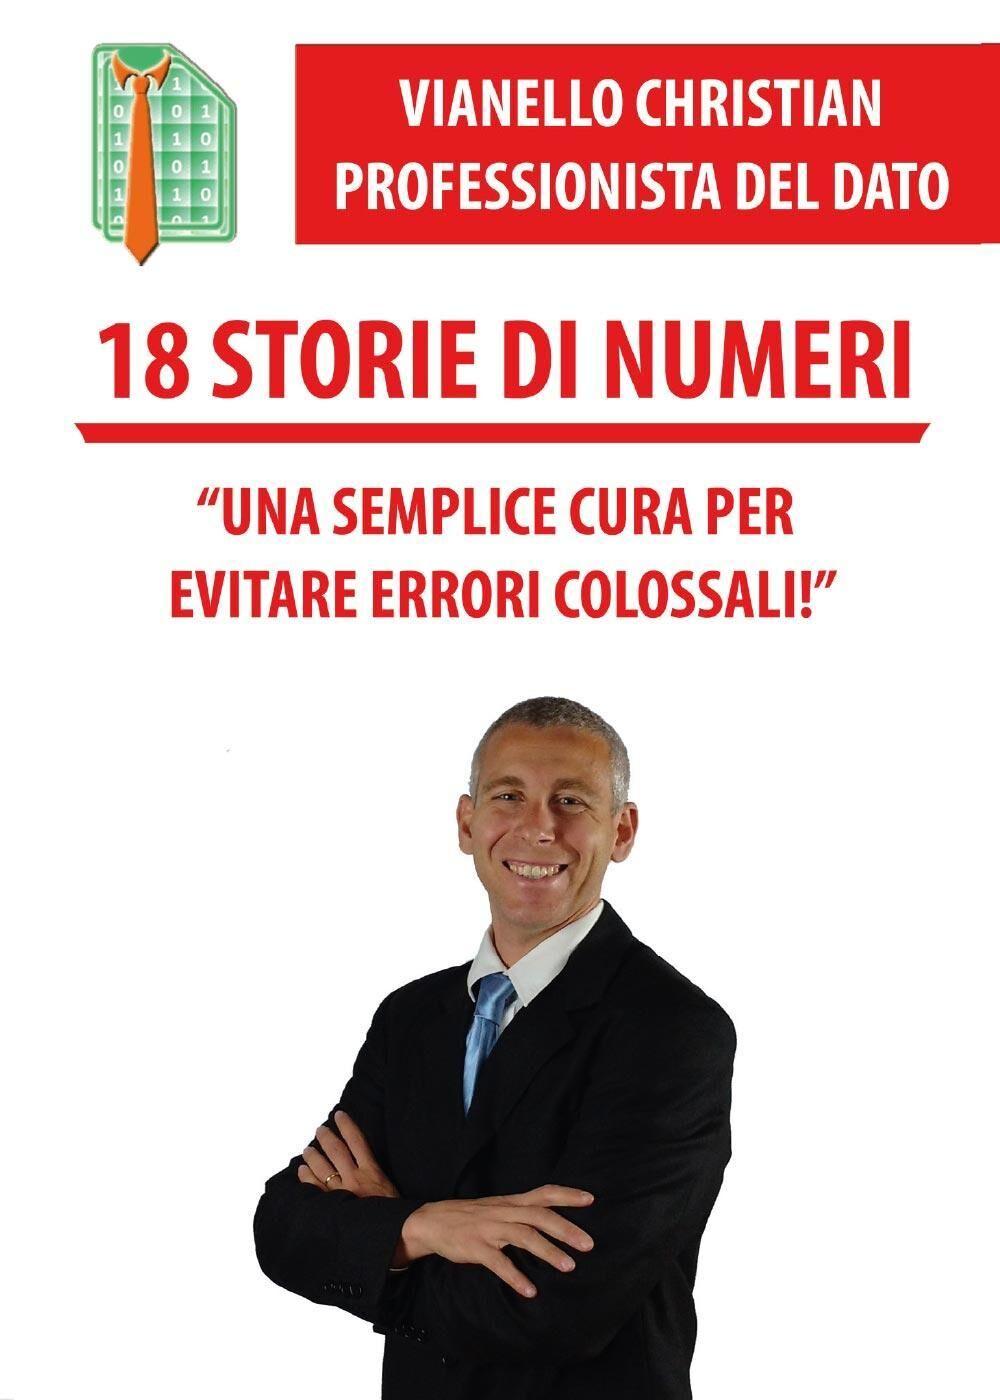 18 storie di numeri